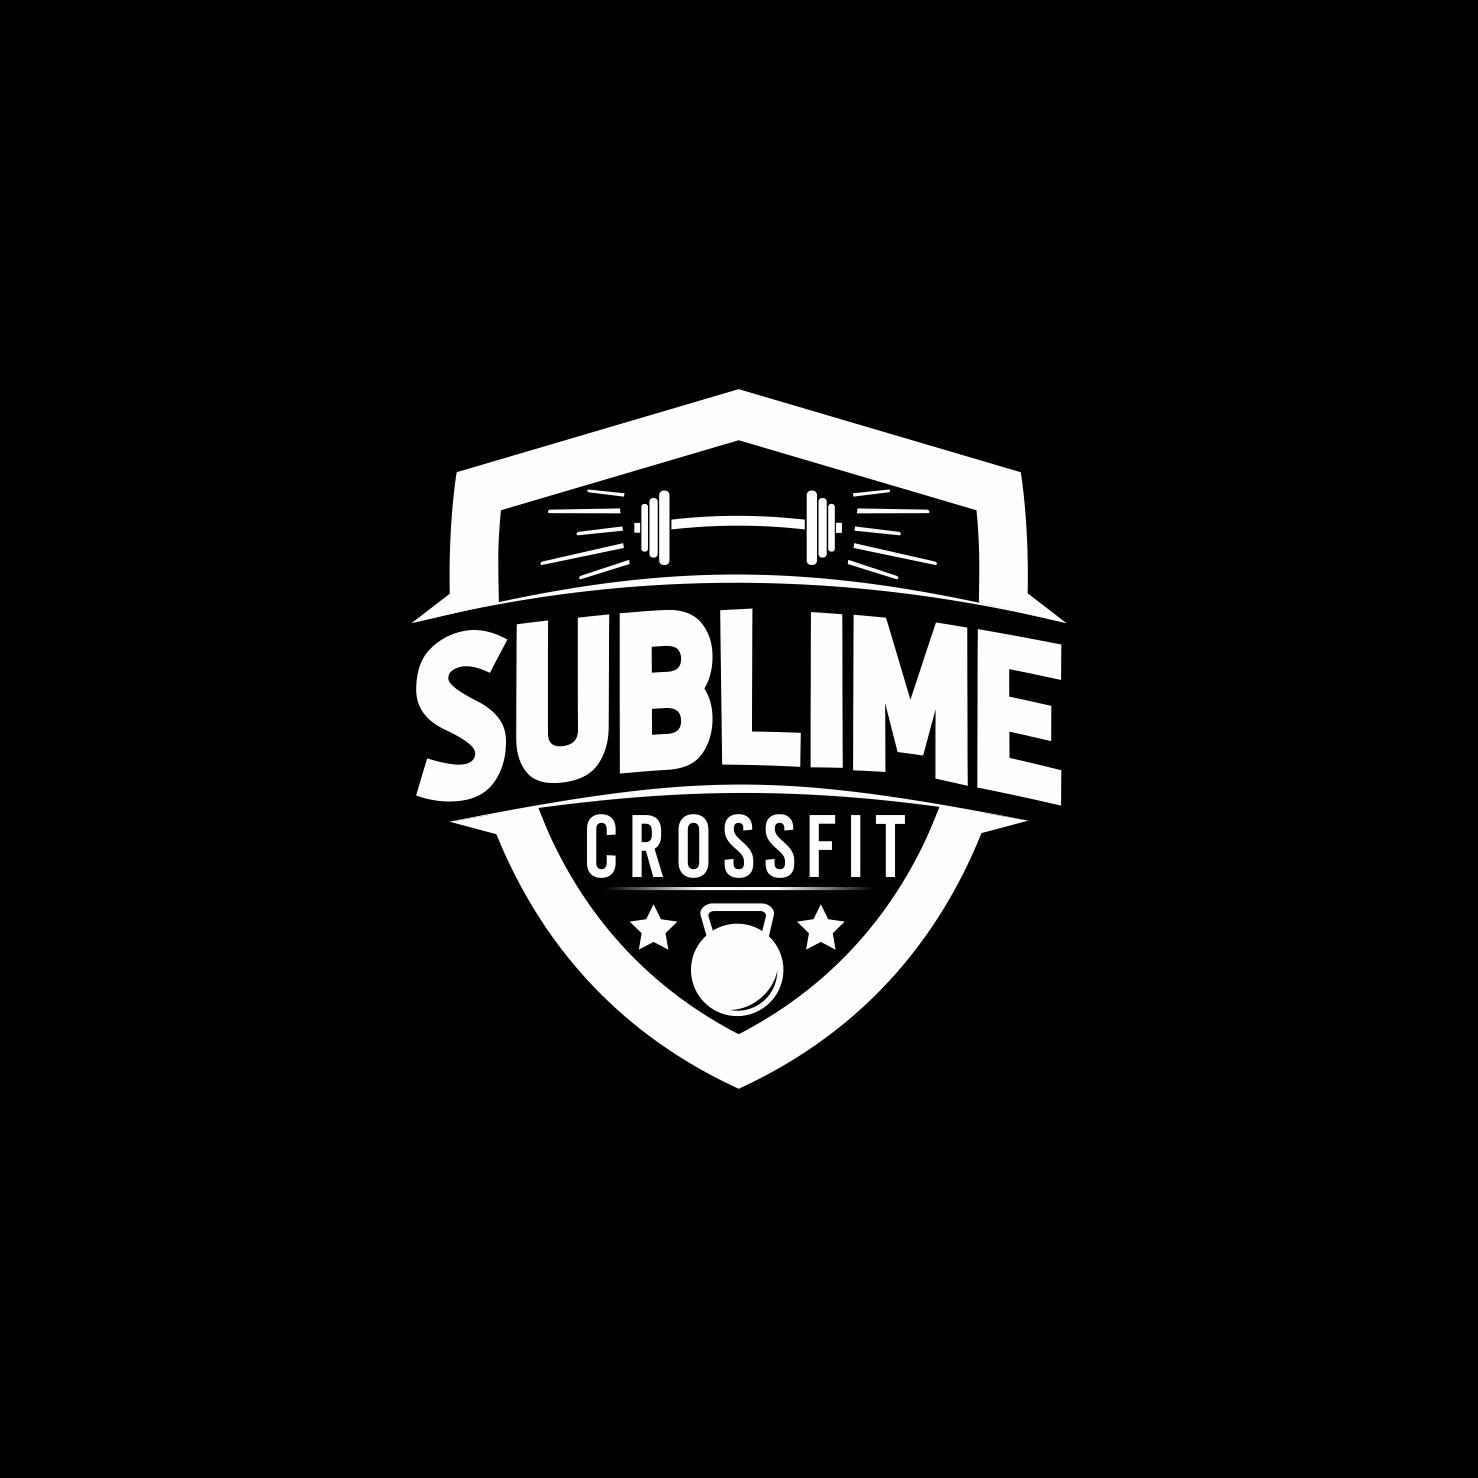 Sublime Crossfit par MarcusGir - DesignCrowd